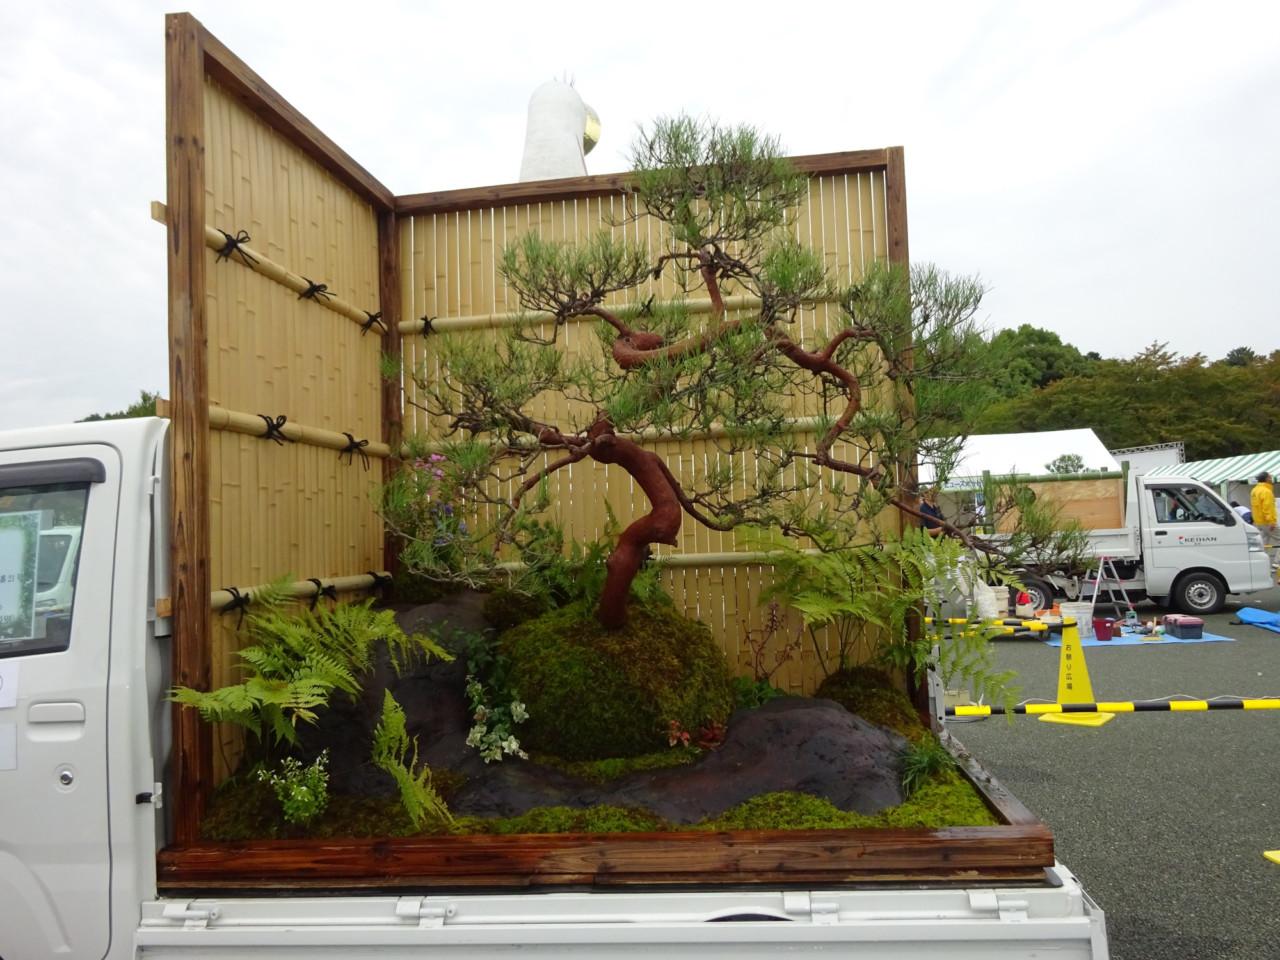 truck-garden-4-640x480@2x